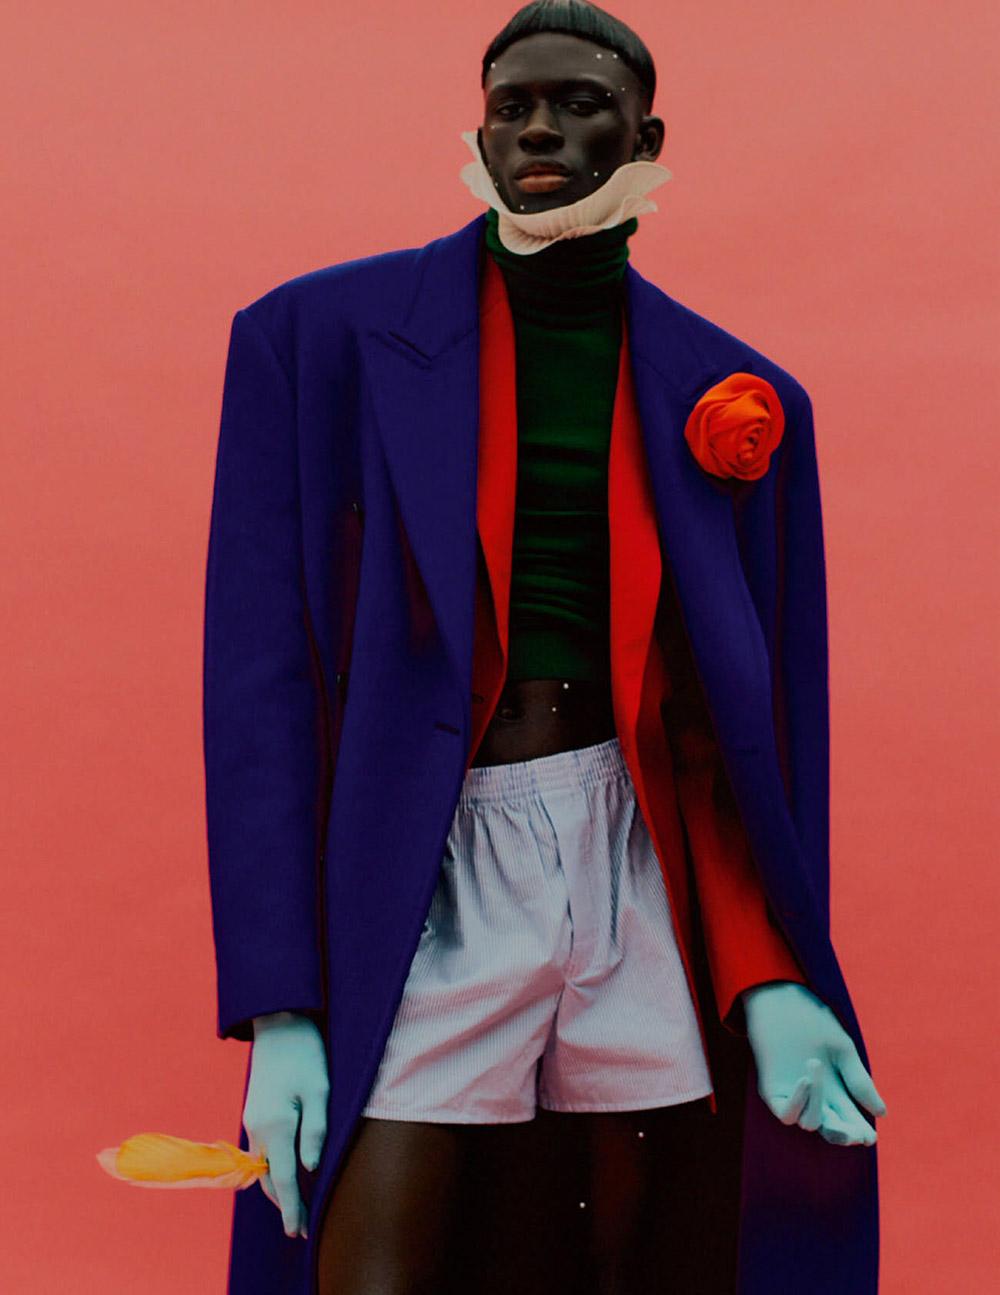 Malick Bodian and Khadim Sock by Rafael Pavarotti for Vogue Hommes Paris Fall/Winter 2020